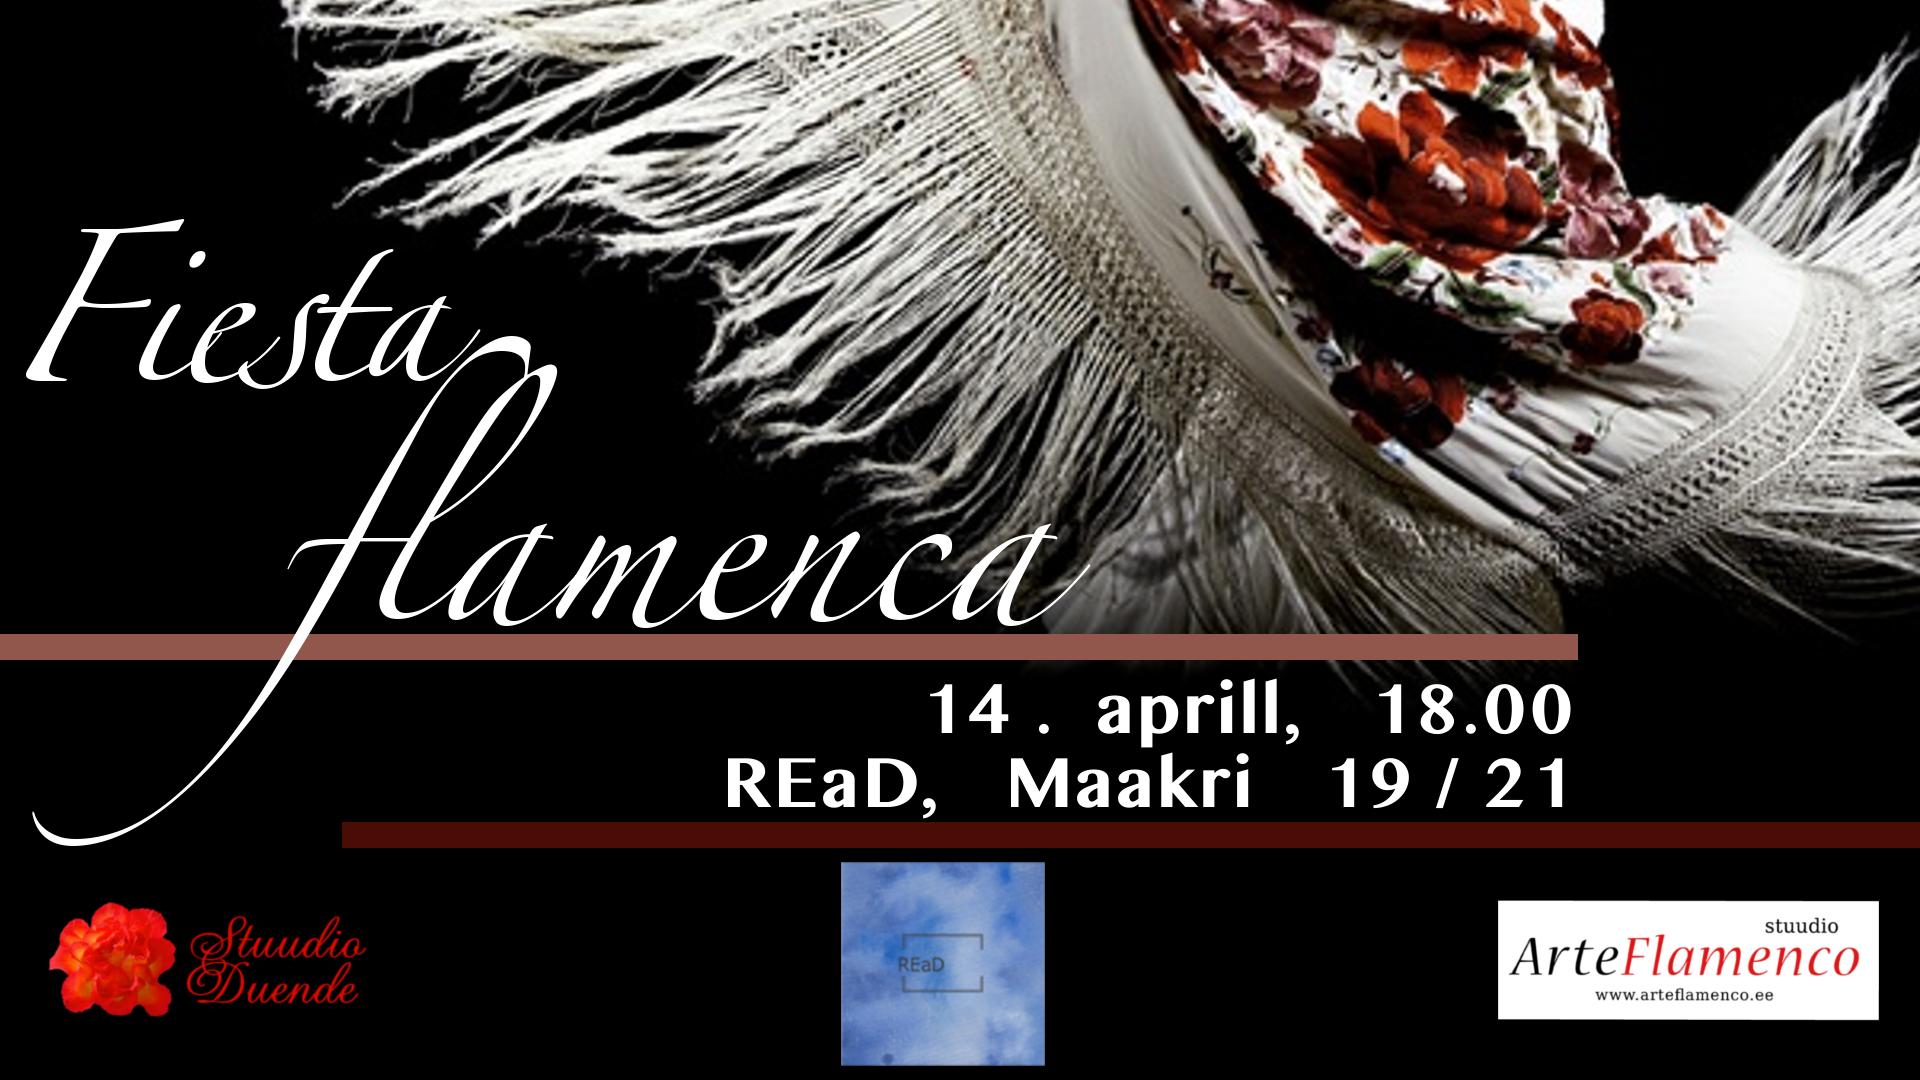 20170414 Cartel Fiesta Flamenca